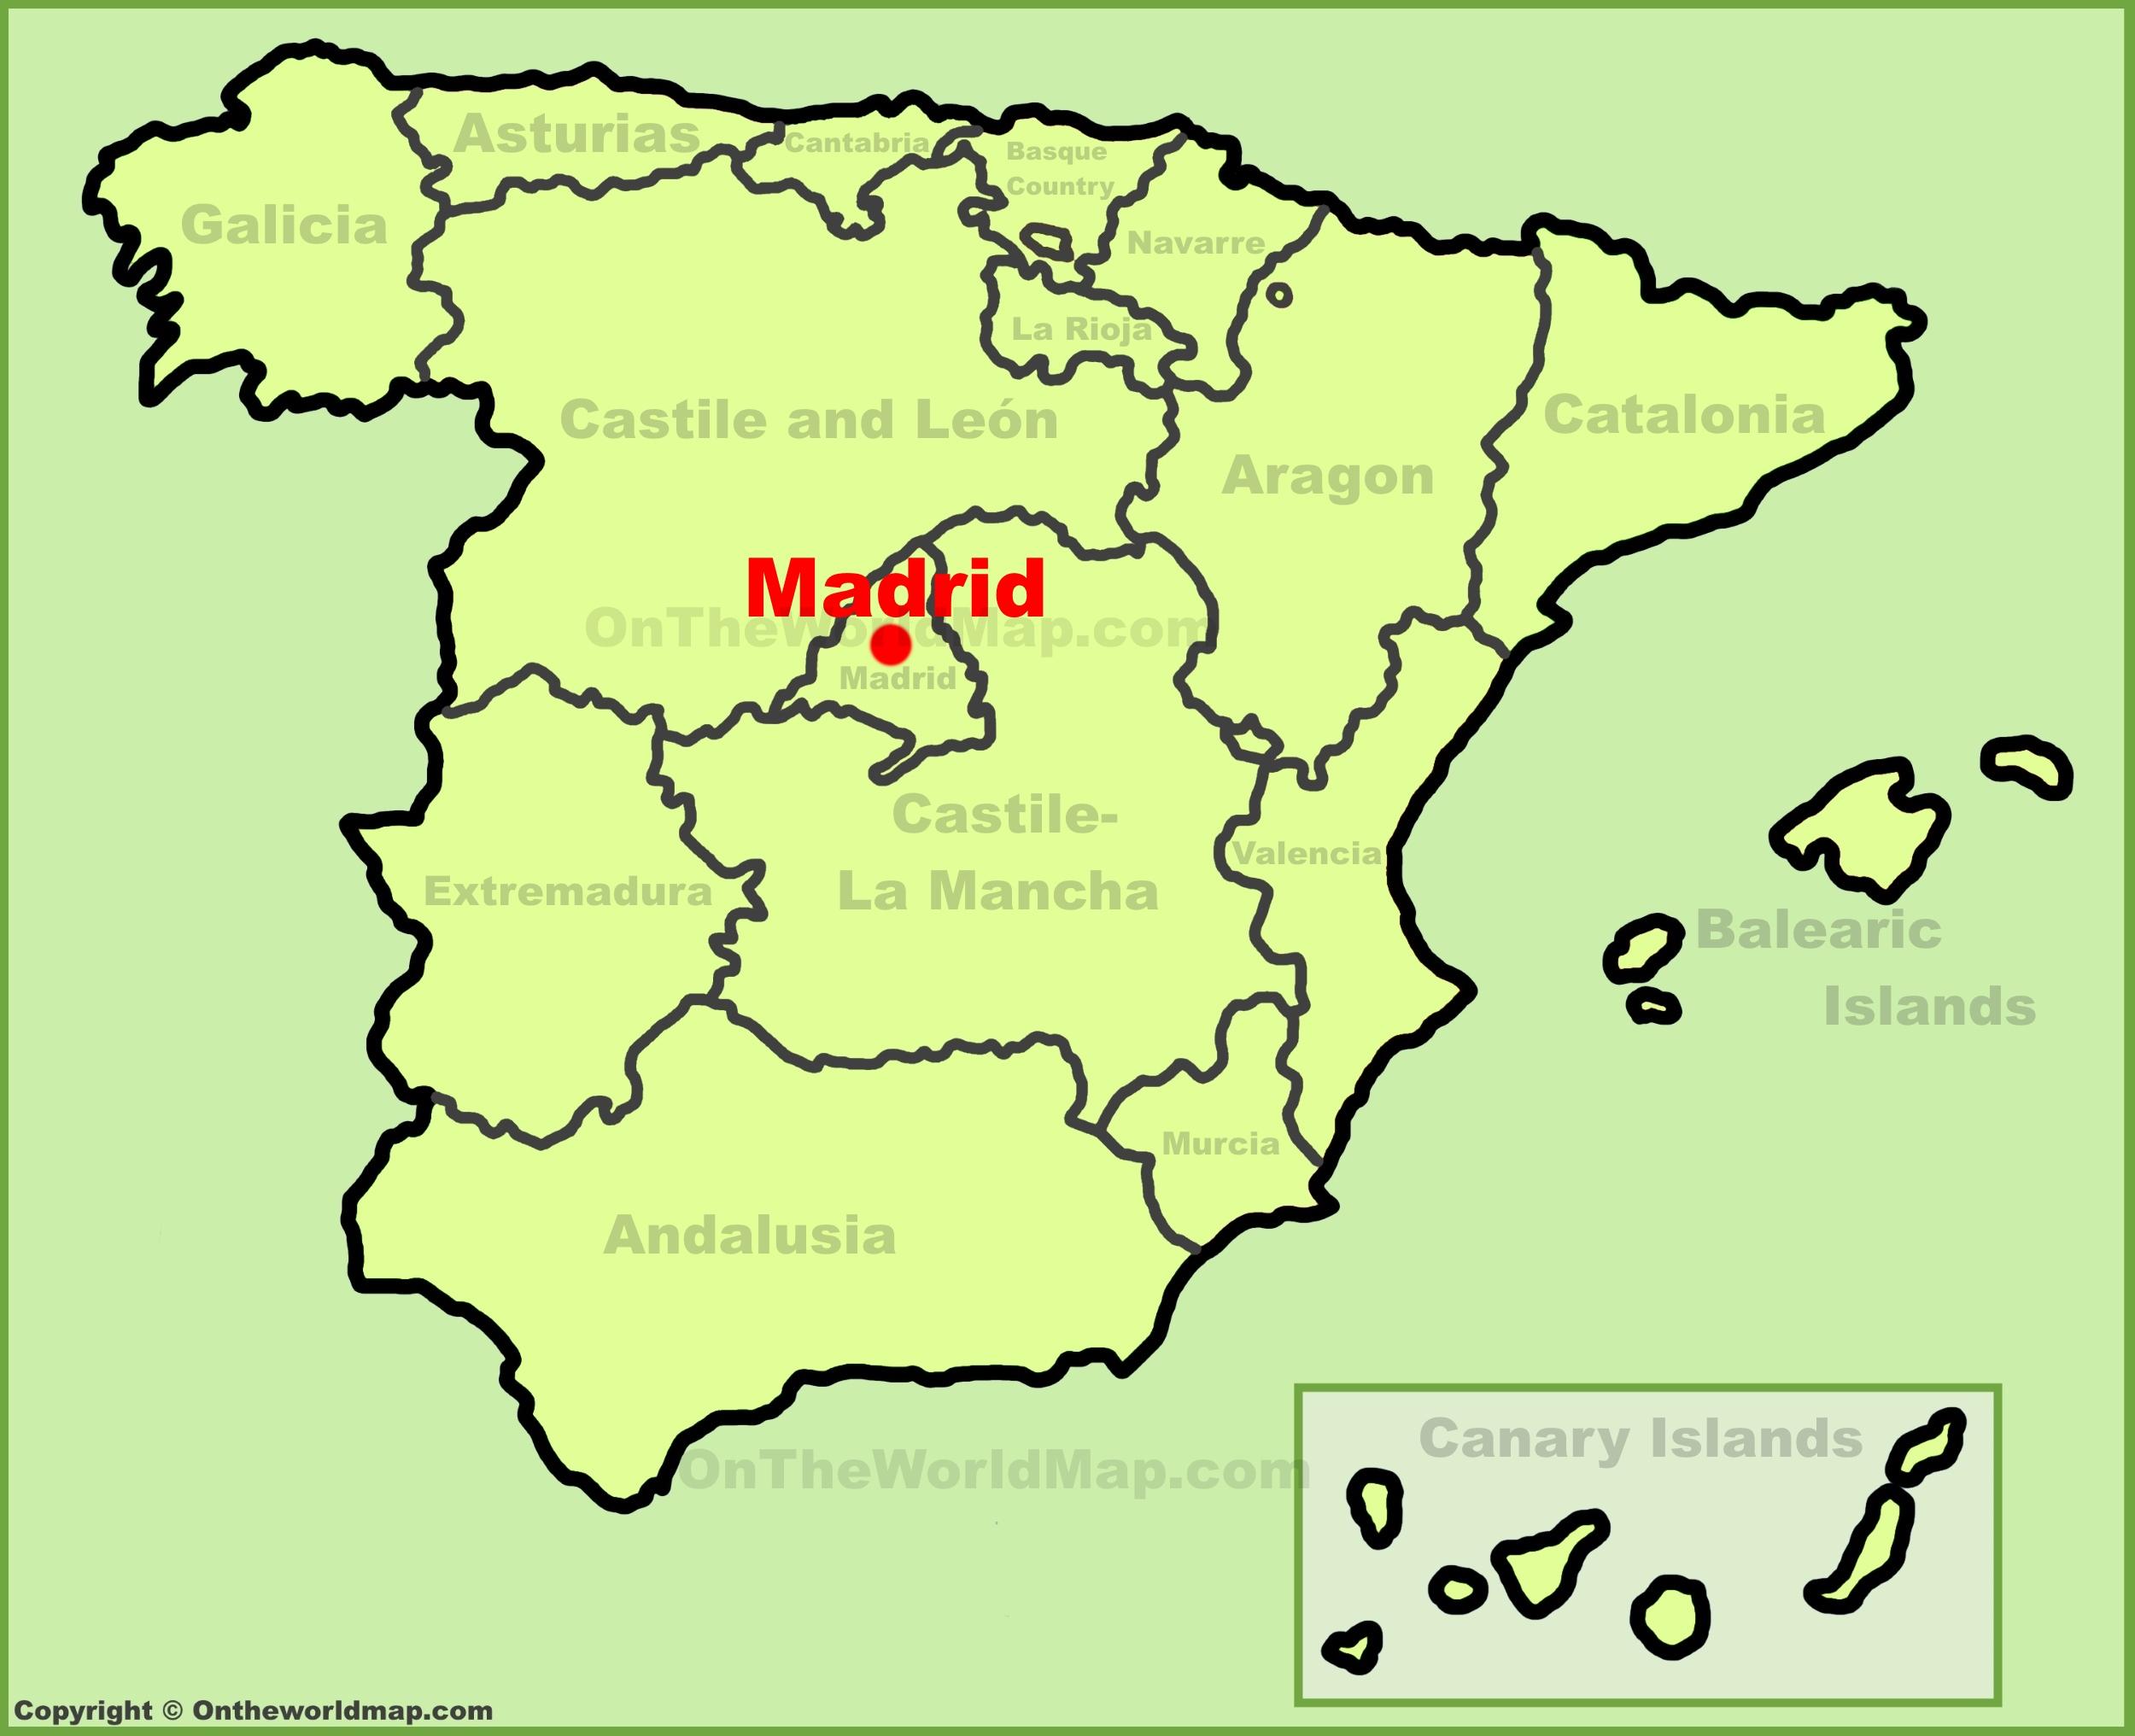 Map Of Madrid Madrid Maps | Spain | Maps of Madrid City